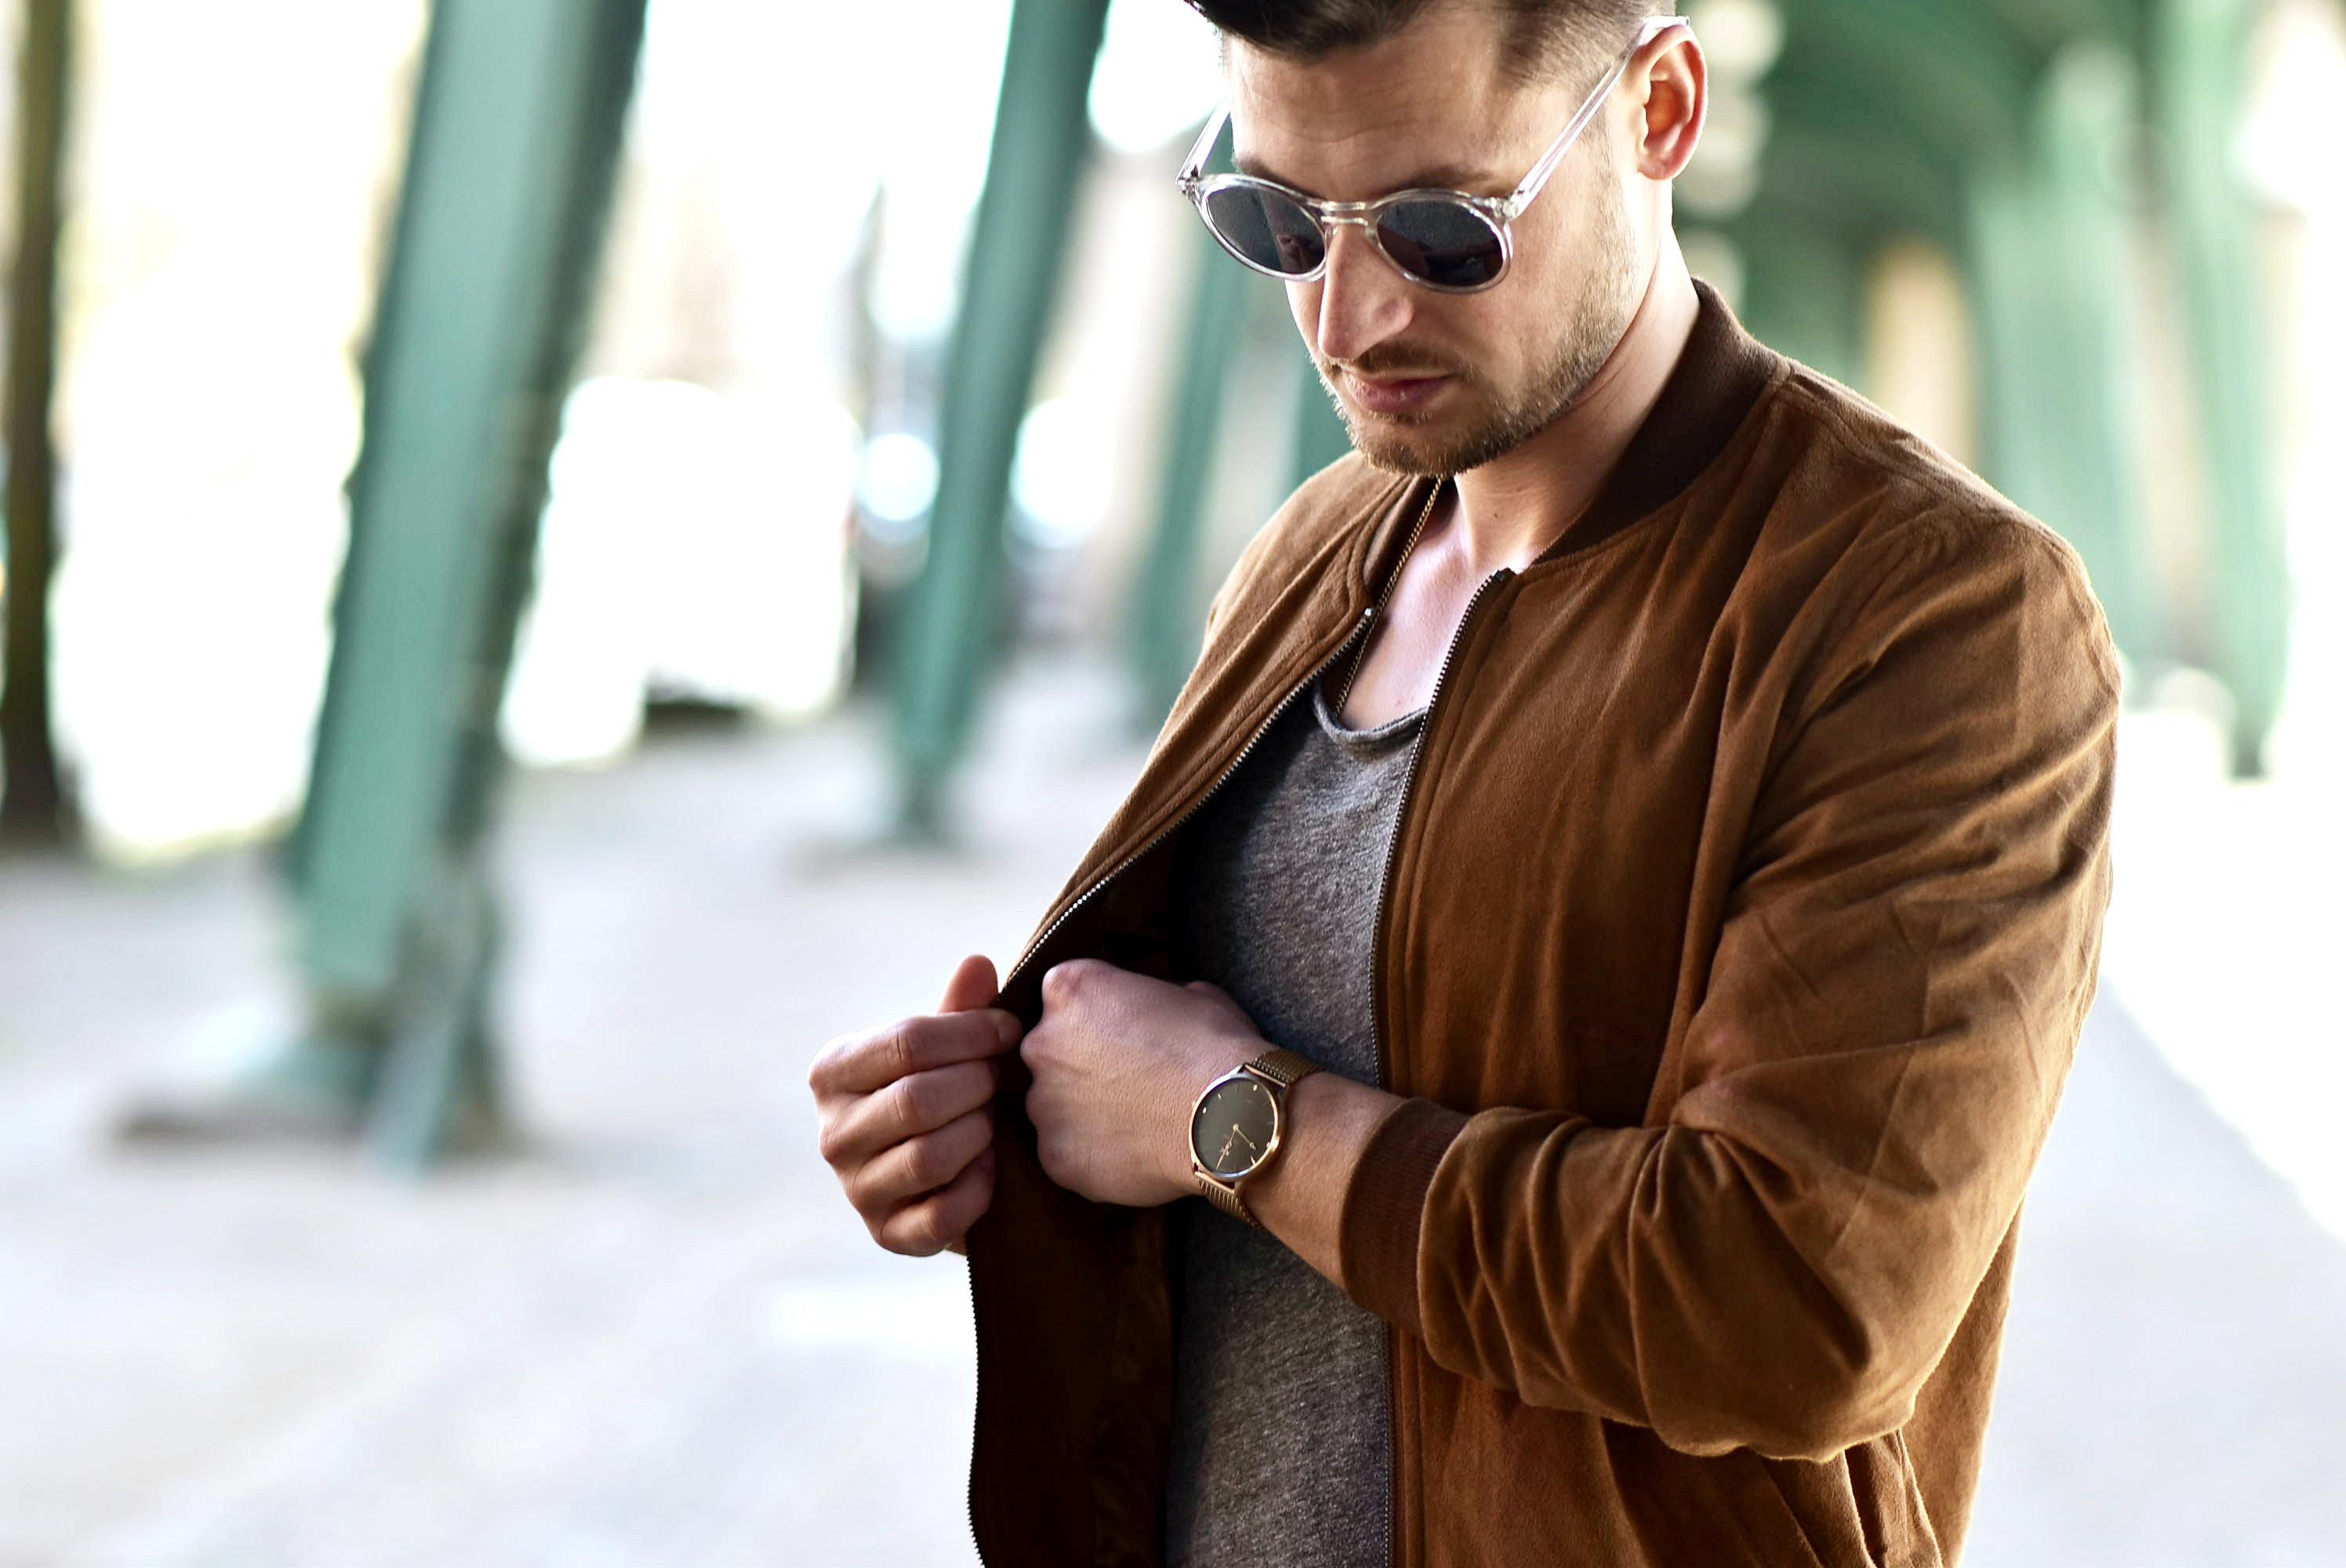 Tommeezjerry-Styleblog-Männerblog-Modeblog-Berlin-Berlinblog-Outfit-Streetlook-Velourslederoptik-Veloursbomberjacke-Bomberjacke-Skinny-Jeans-Chelseaboots-Sonnenbrille-Graues-Shirt.jpg